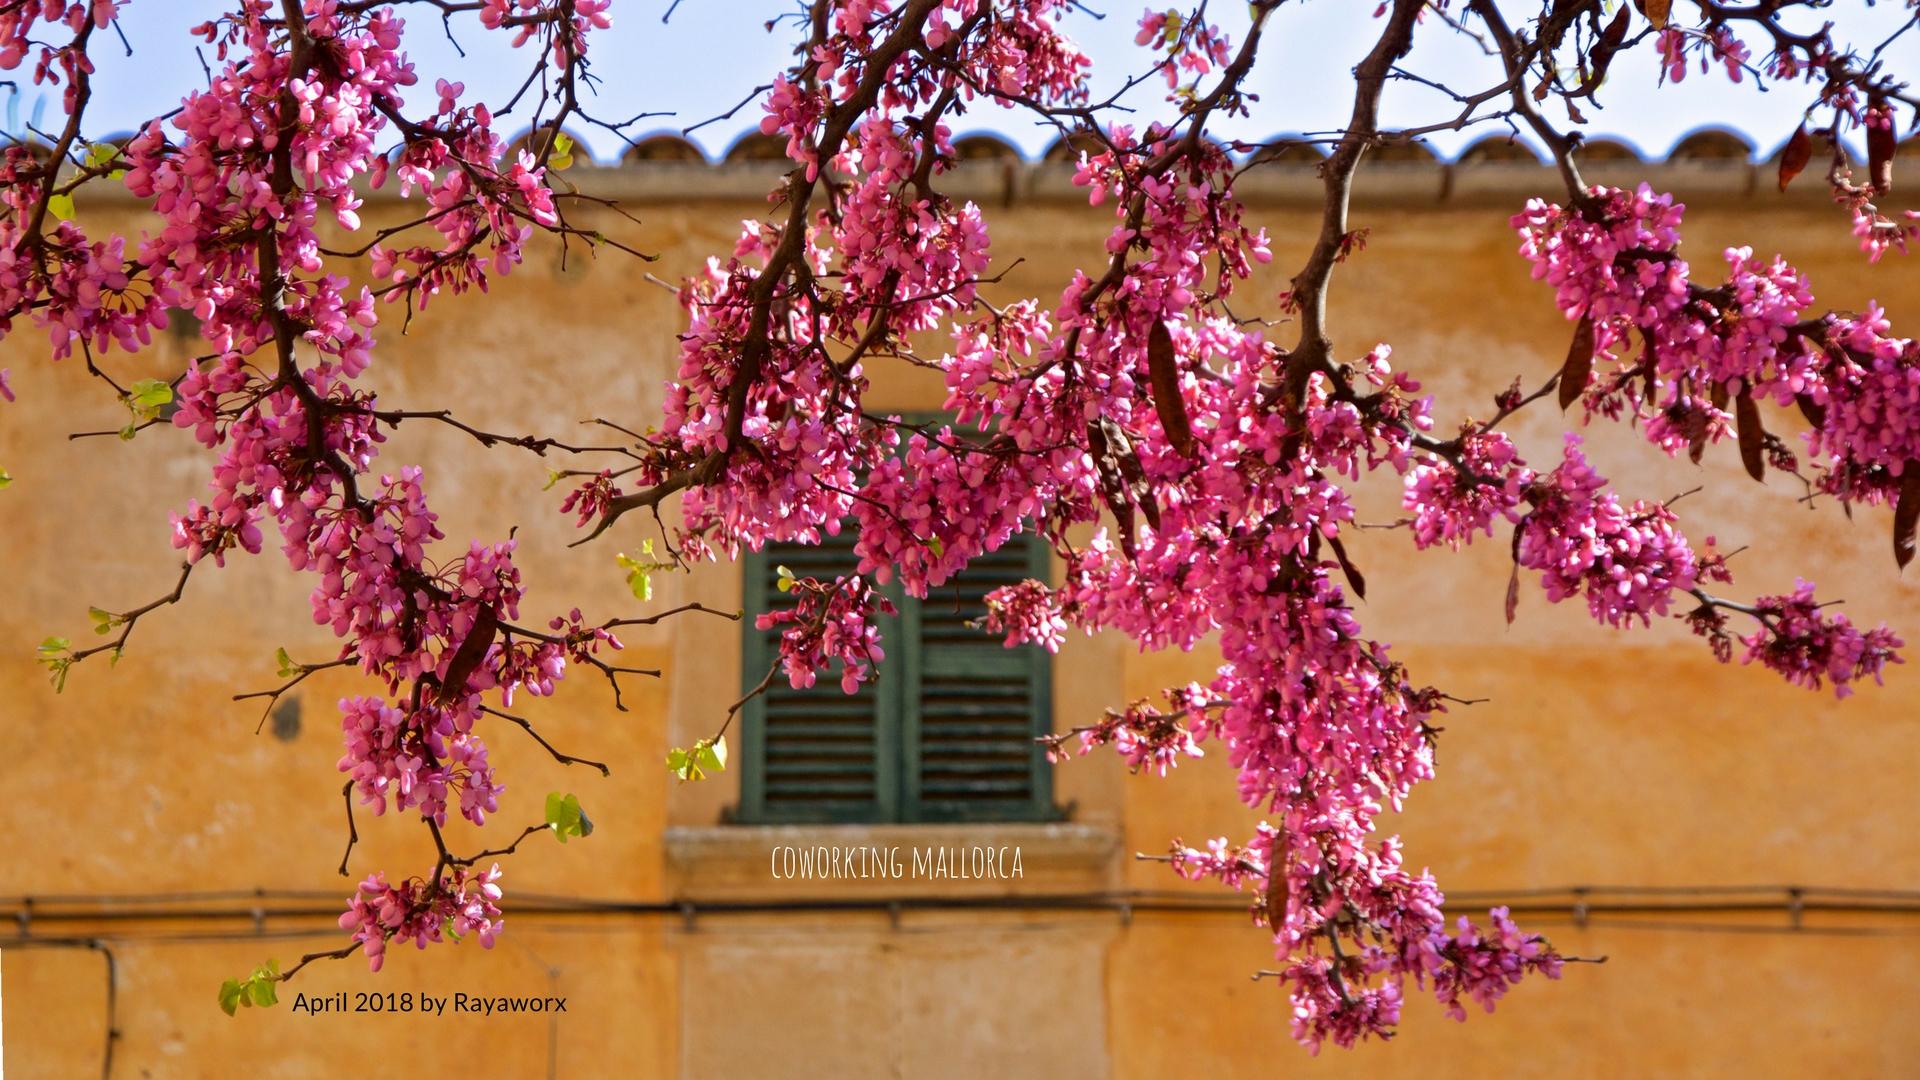 Mallorca Wallpaper Rayaworx April